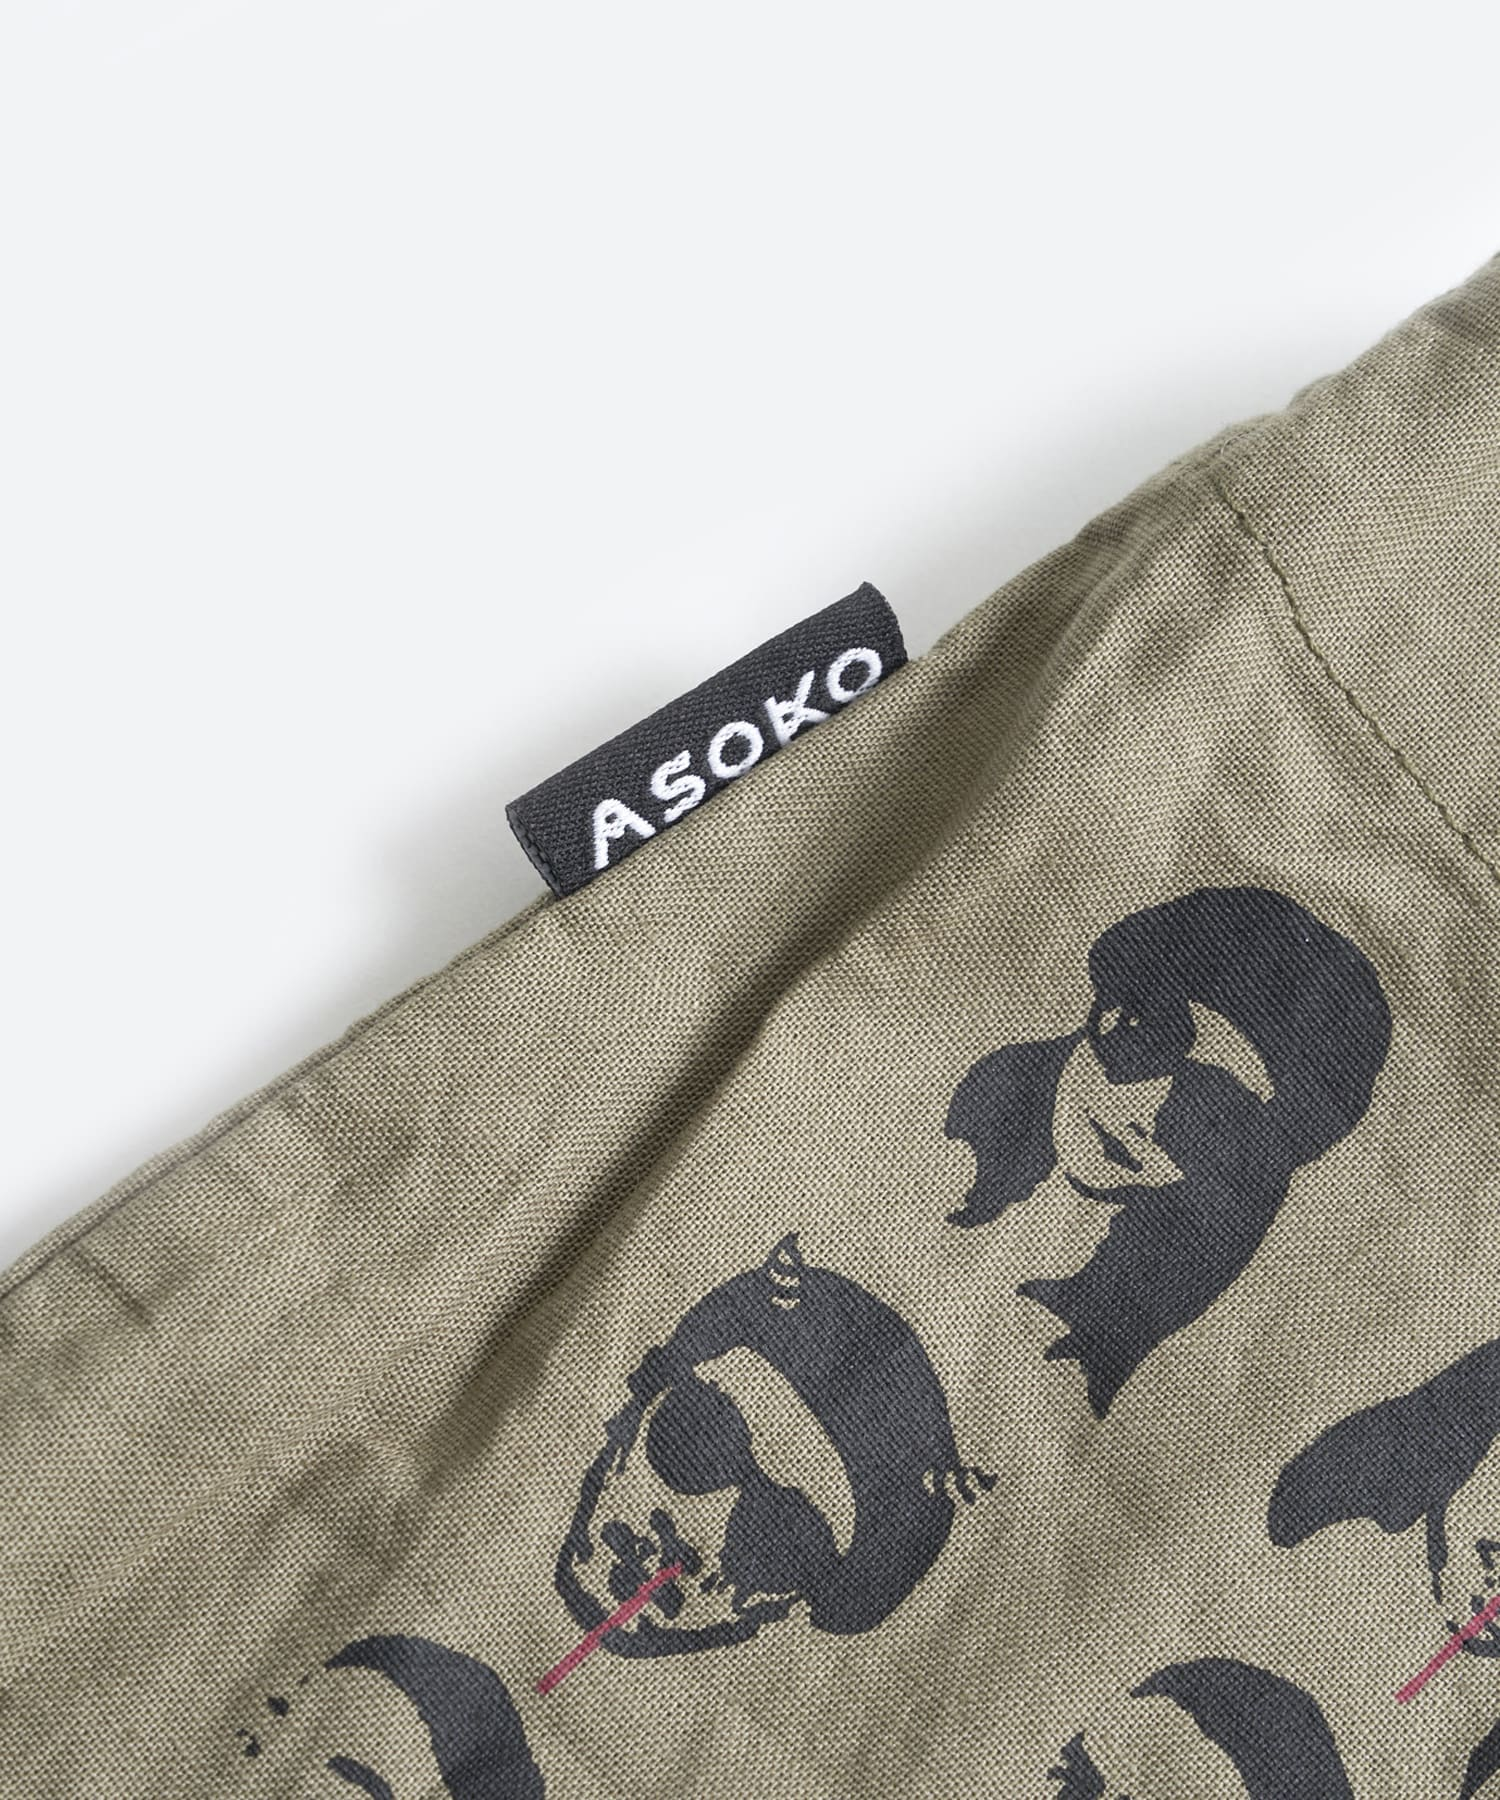 ASOKO(アソコ) 【WEB限定】buggy柄ワンショルダーバッグ